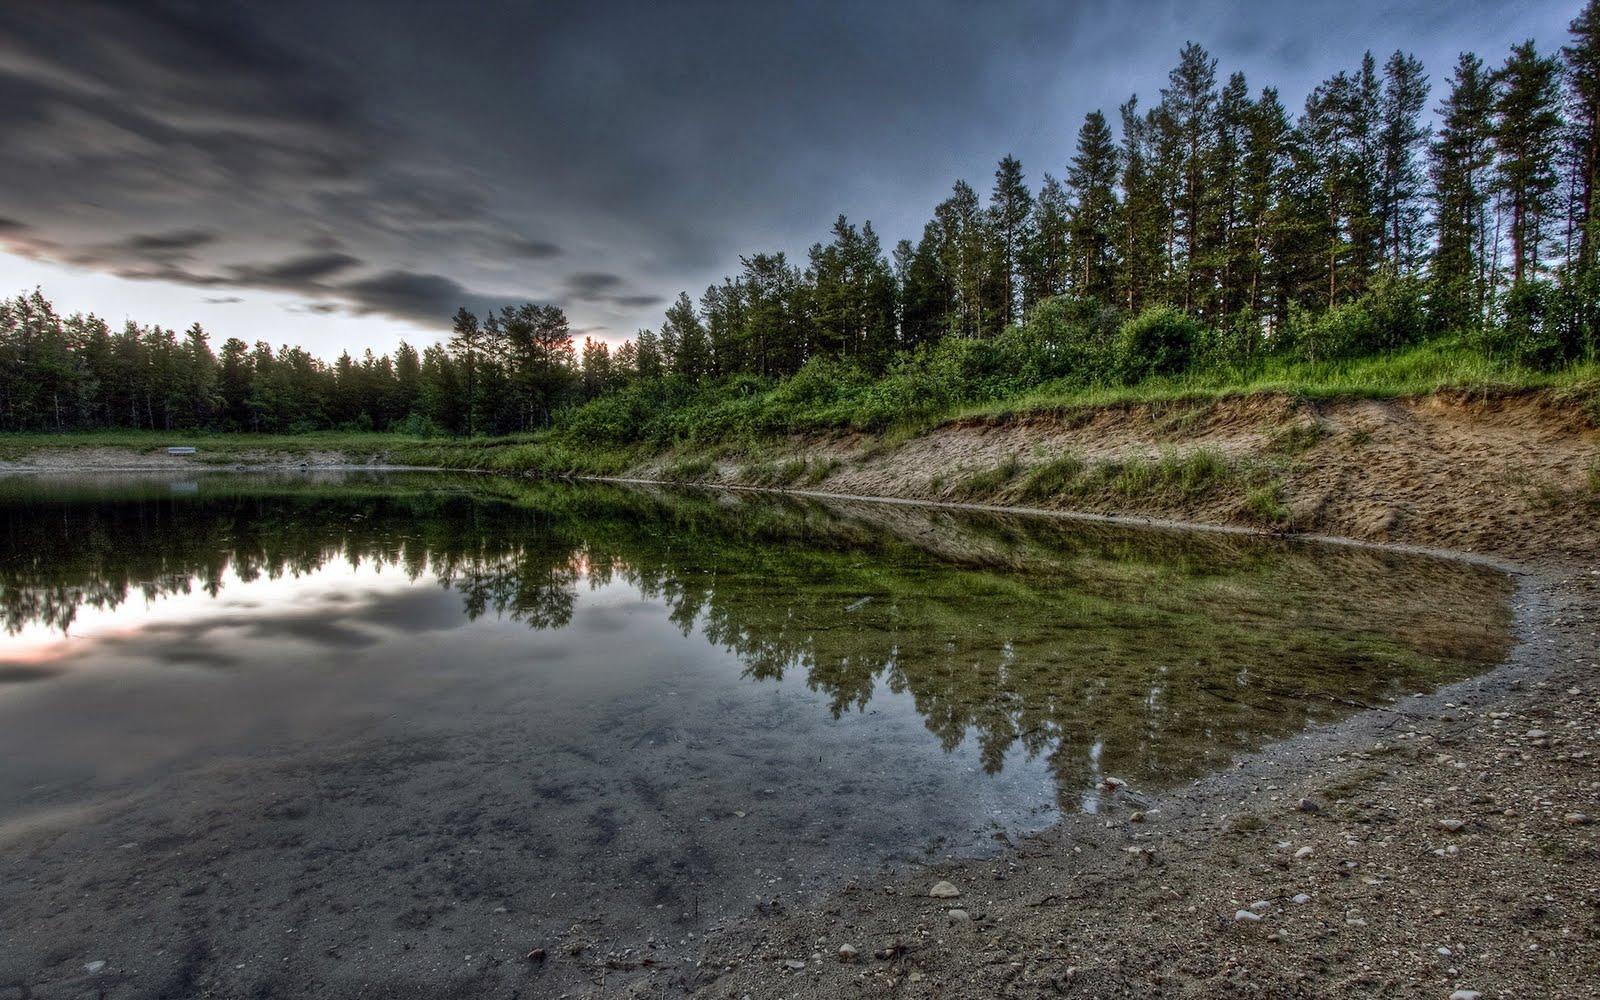 http://4.bp.blogspot.com/-3Mt2G9N-BtI/TeG4fUIj2VI/AAAAAAAAAH8/gPoWn2Nlw_g/s1600/BEautFull+Water+Scenery+Wallpapers+%252815%2529.jpg